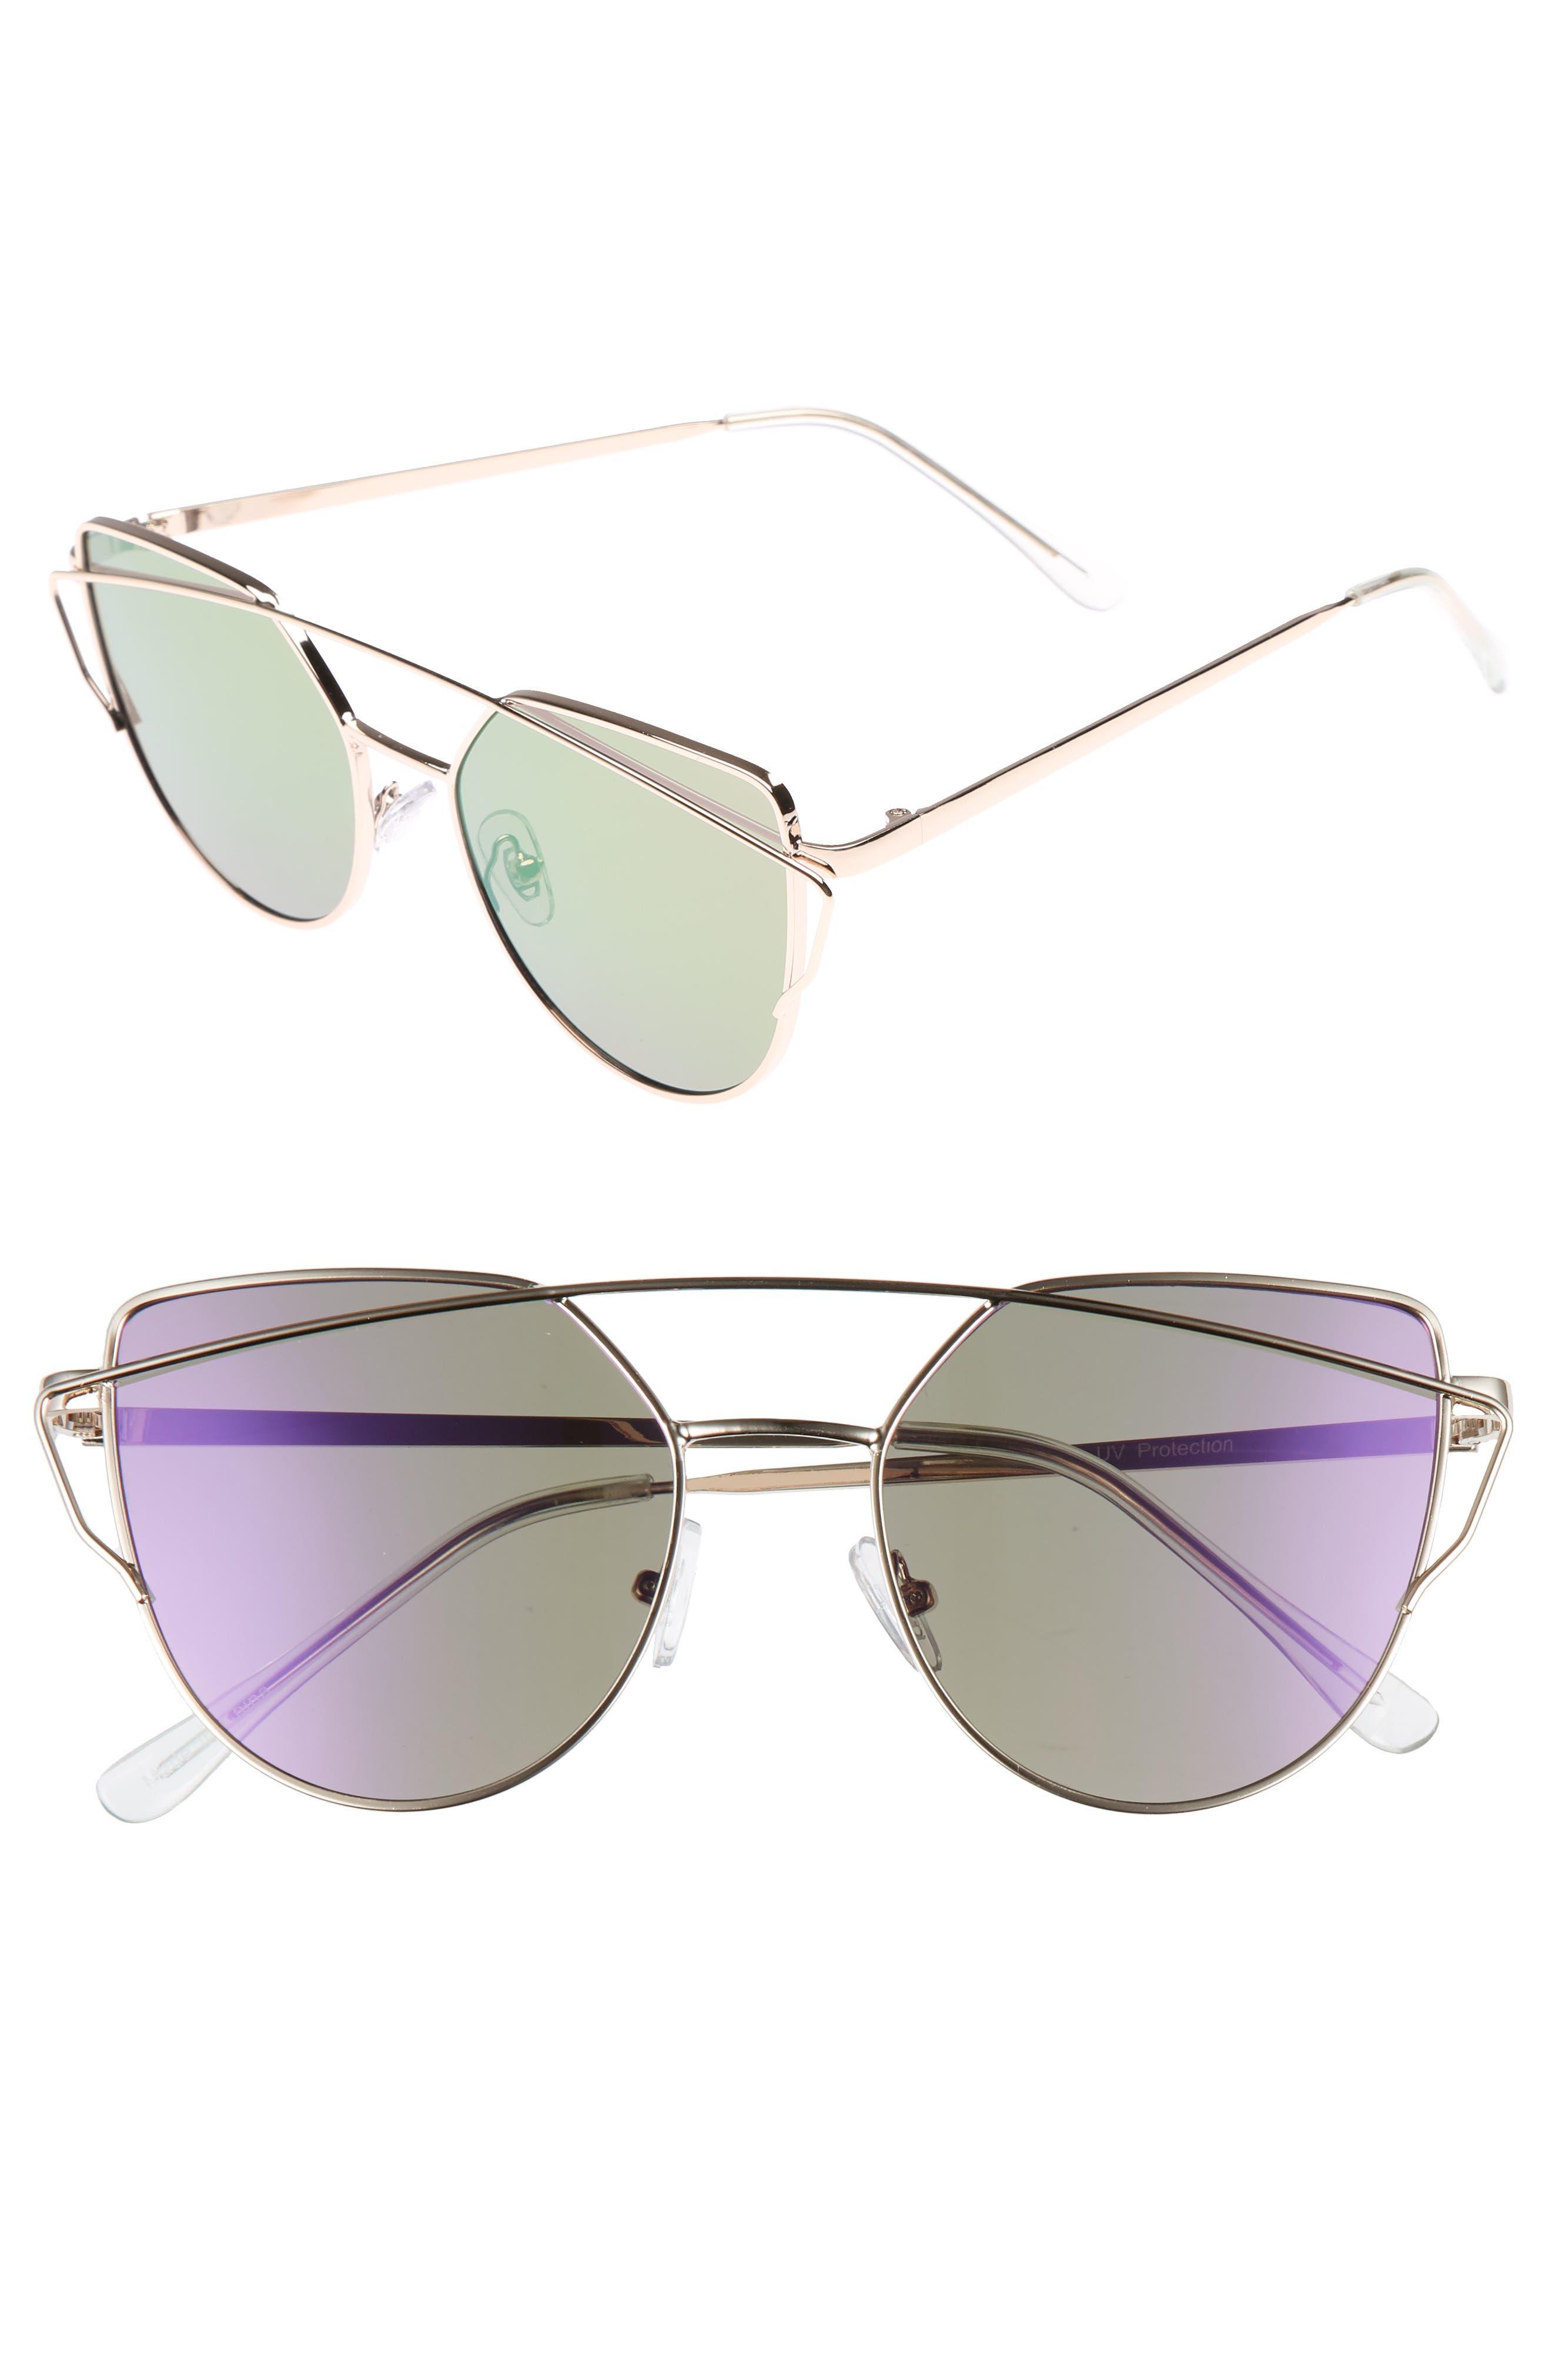 52mm Thin Brow Angular Aviator Sunglasses,                             Main thumbnail 1, color,                             Gold/ Purple